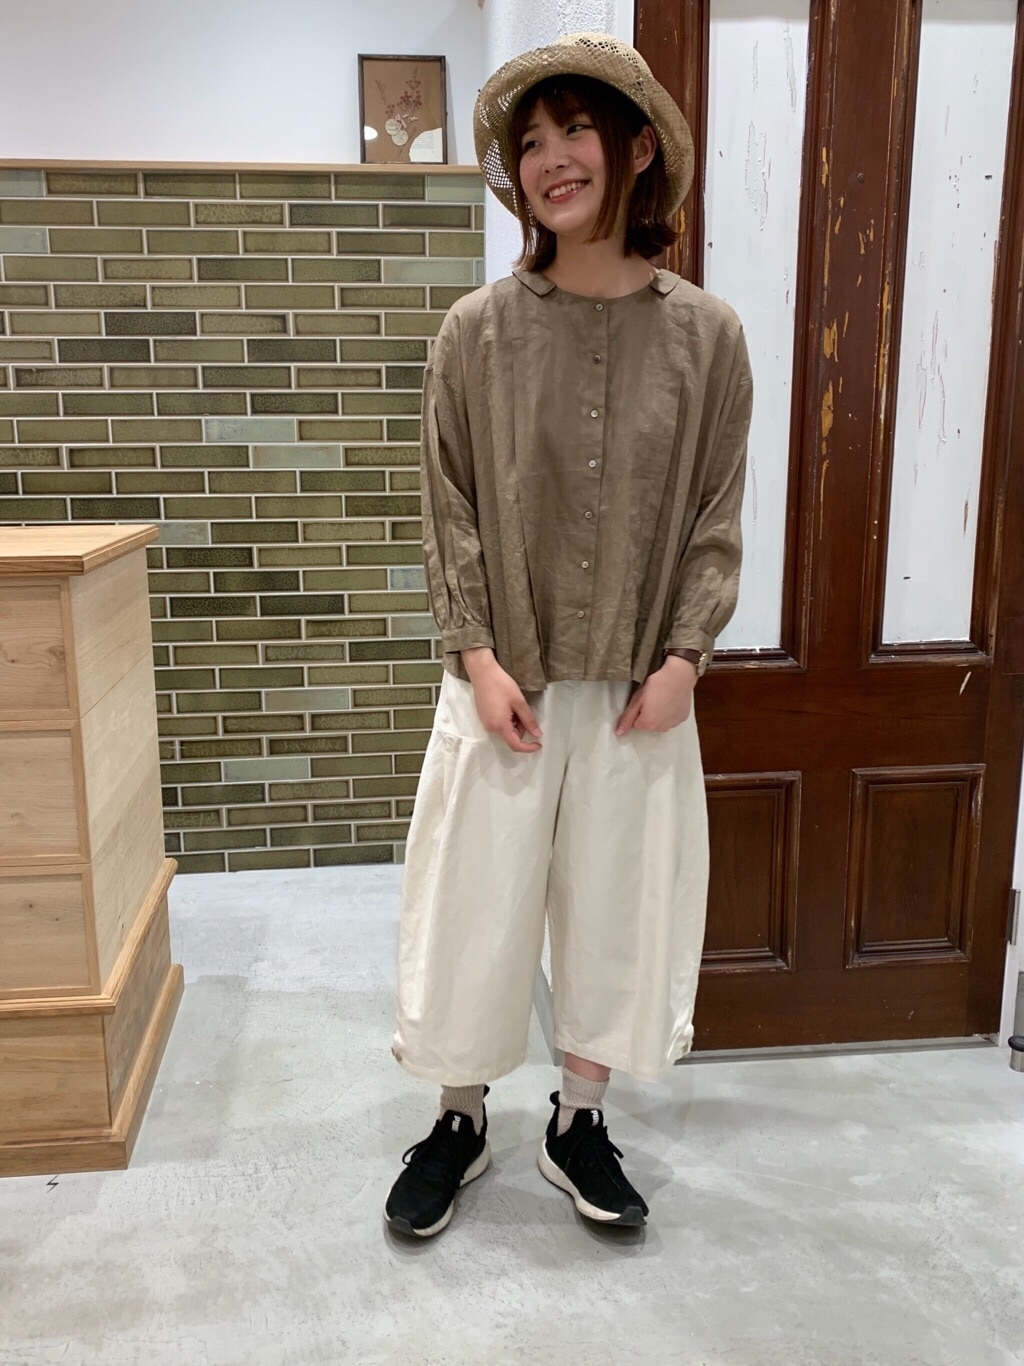 chambre de charme 横浜ジョイナス 身長:162cm 2020.03.13